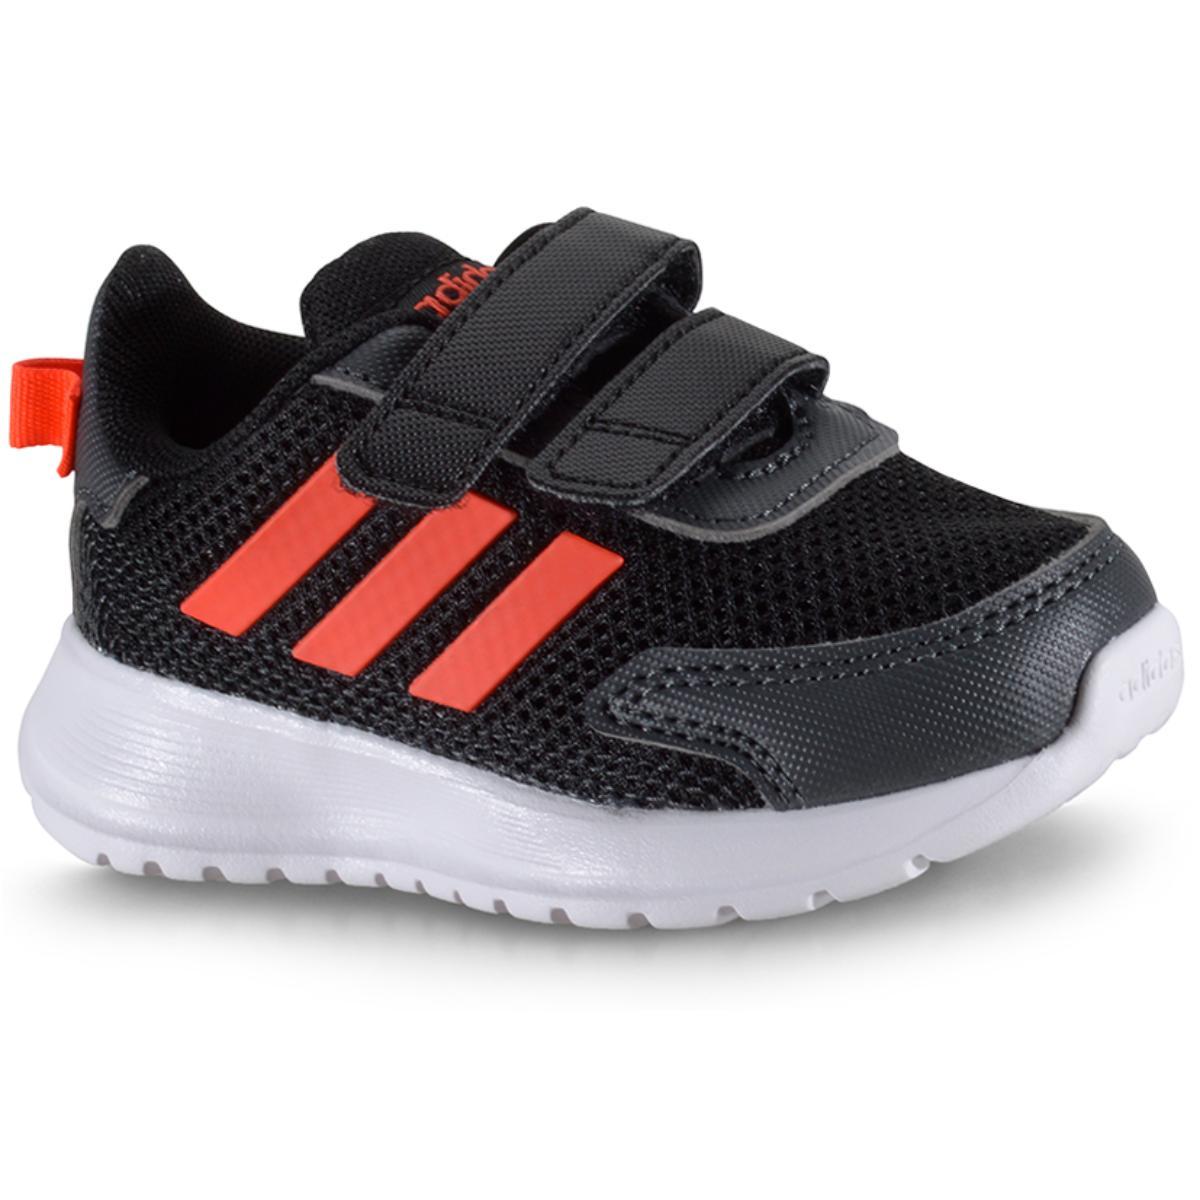 Tênis Uni Infantil Adidas Eg4139 Tensauer Run i Preto/coral